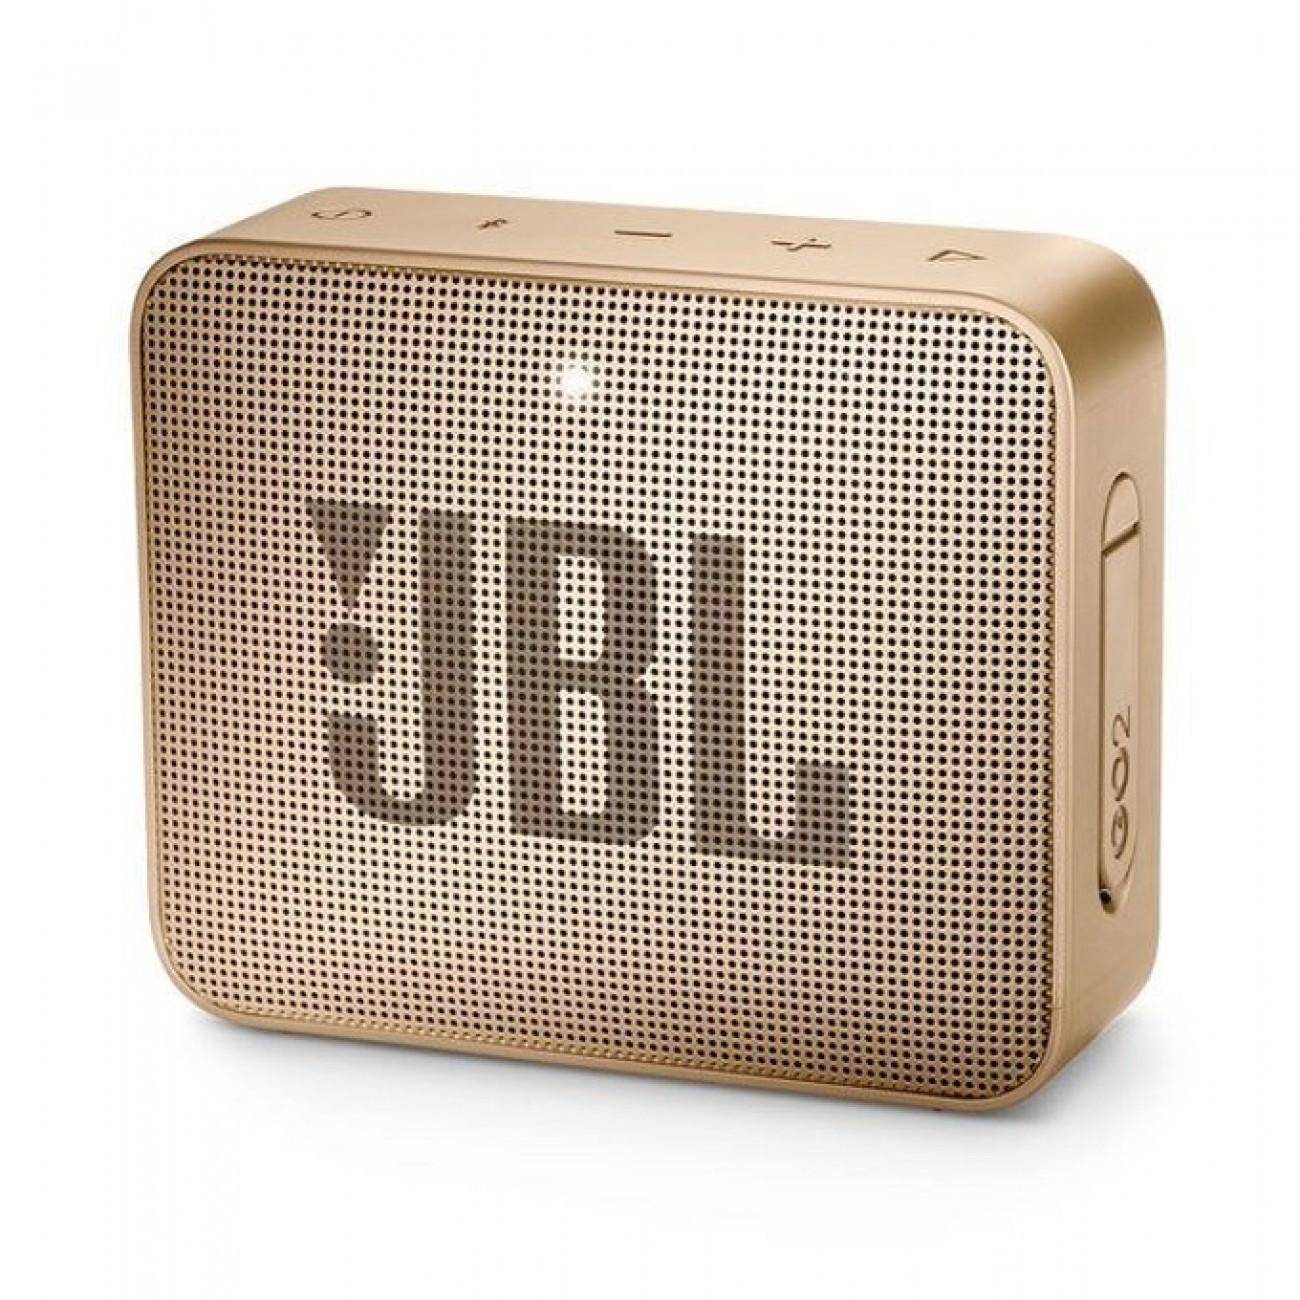 Тонколона JBL GO 2, 1.0, 3W RMS, 3.5mm jack/Bluetooth, златиста, до 5 часа работа, IPX7 в Колони - JBL | Alleop